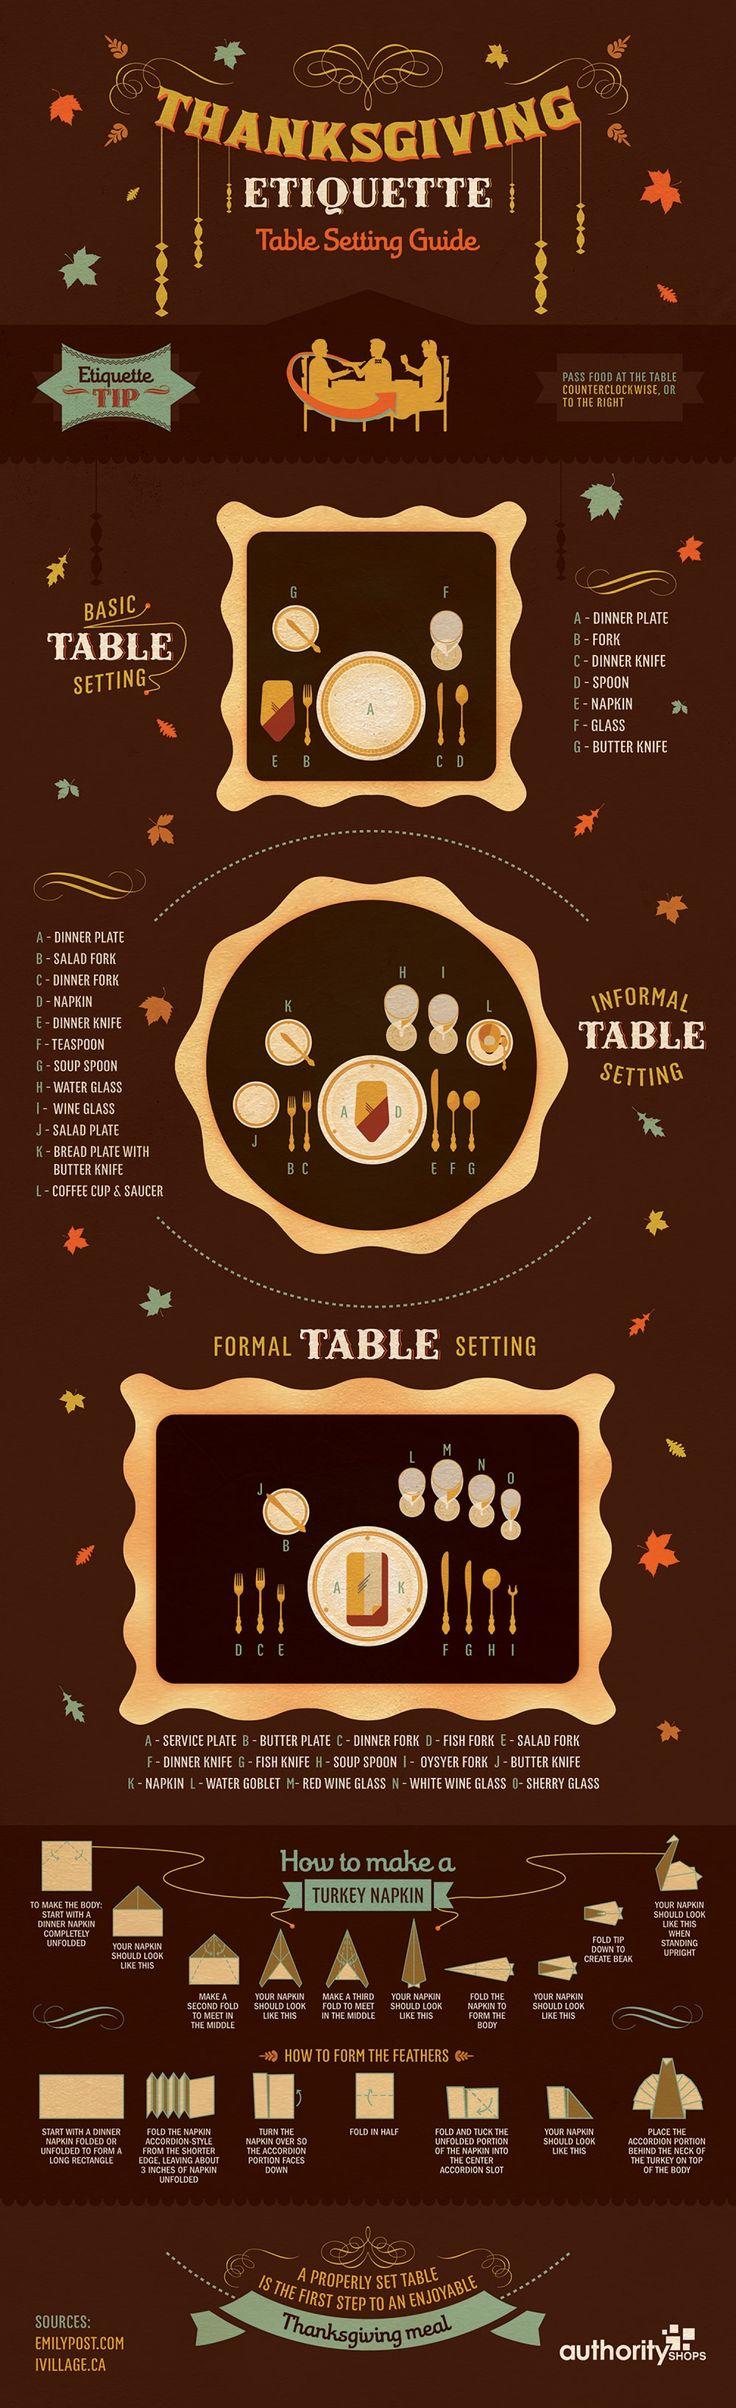 Thanksgiving Etiquette Infographic